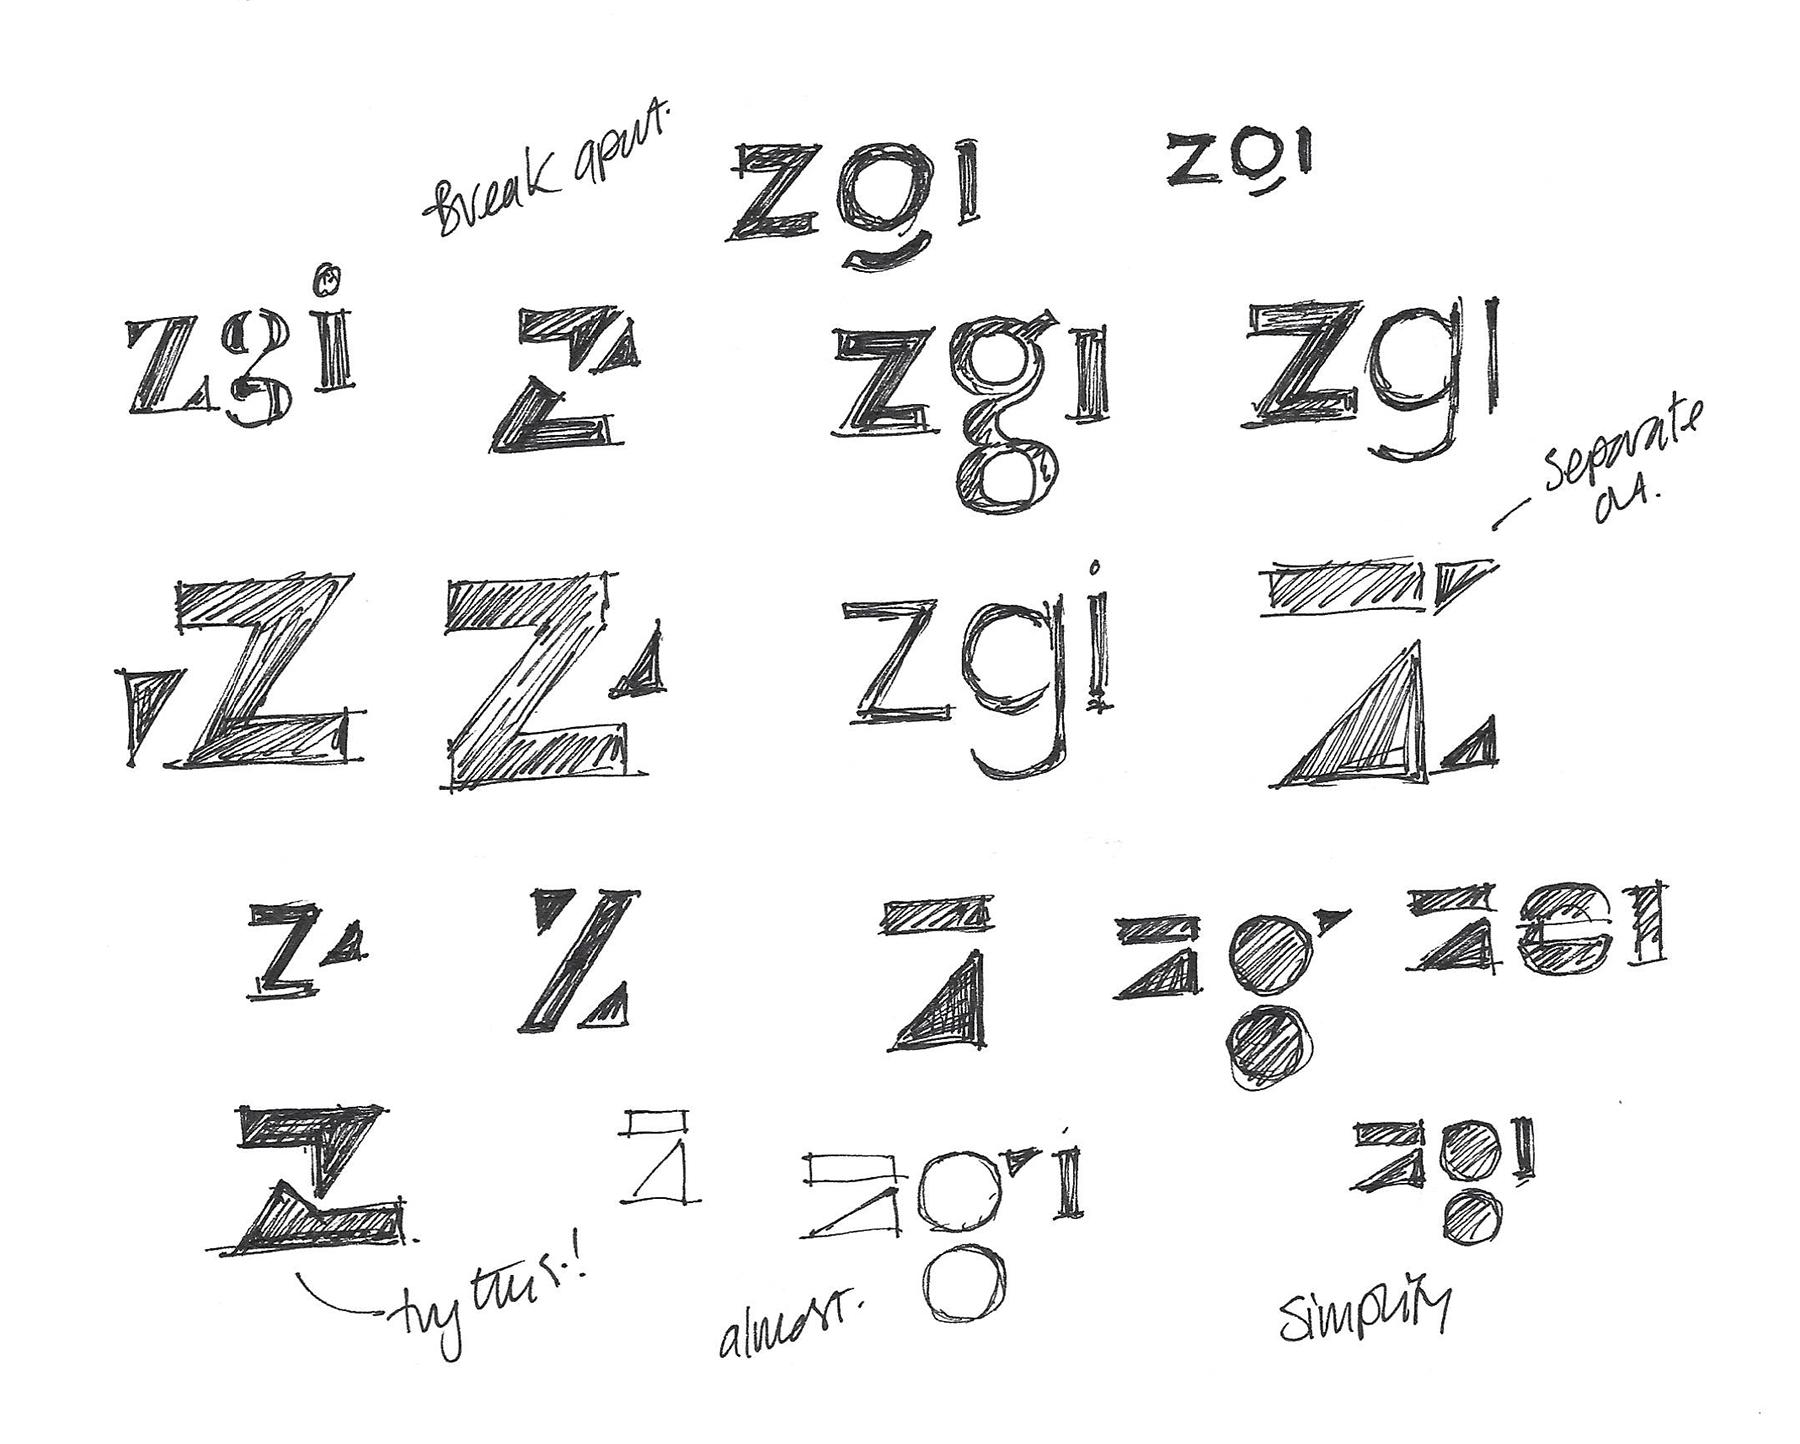 zgi-logo-sketches-2.png